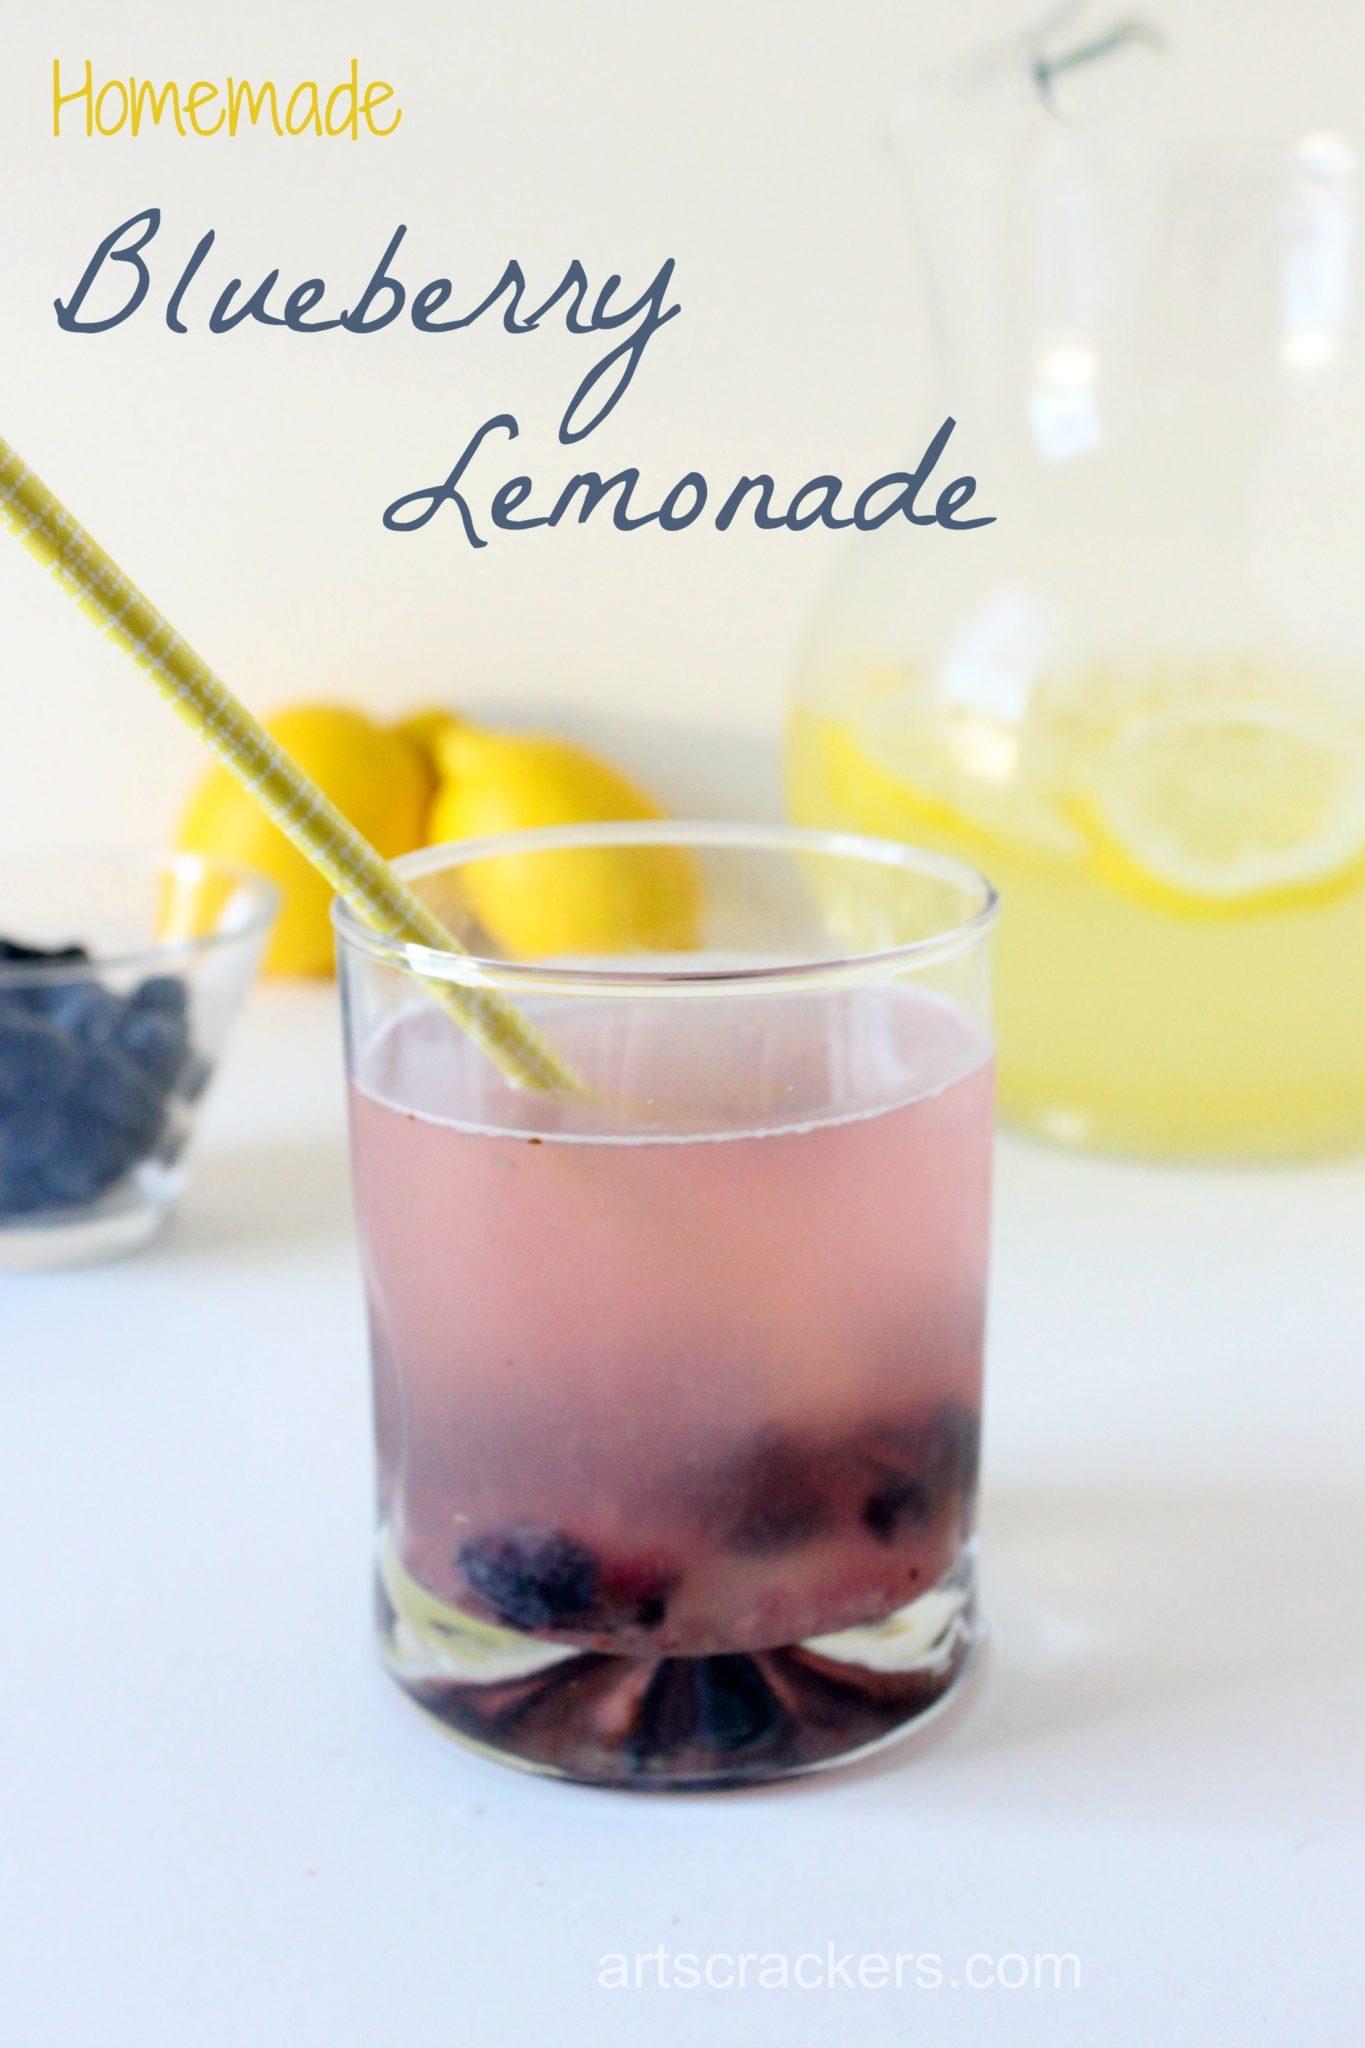 Homemade Refreshing Blueberry Lemonade. Click for the recipe.